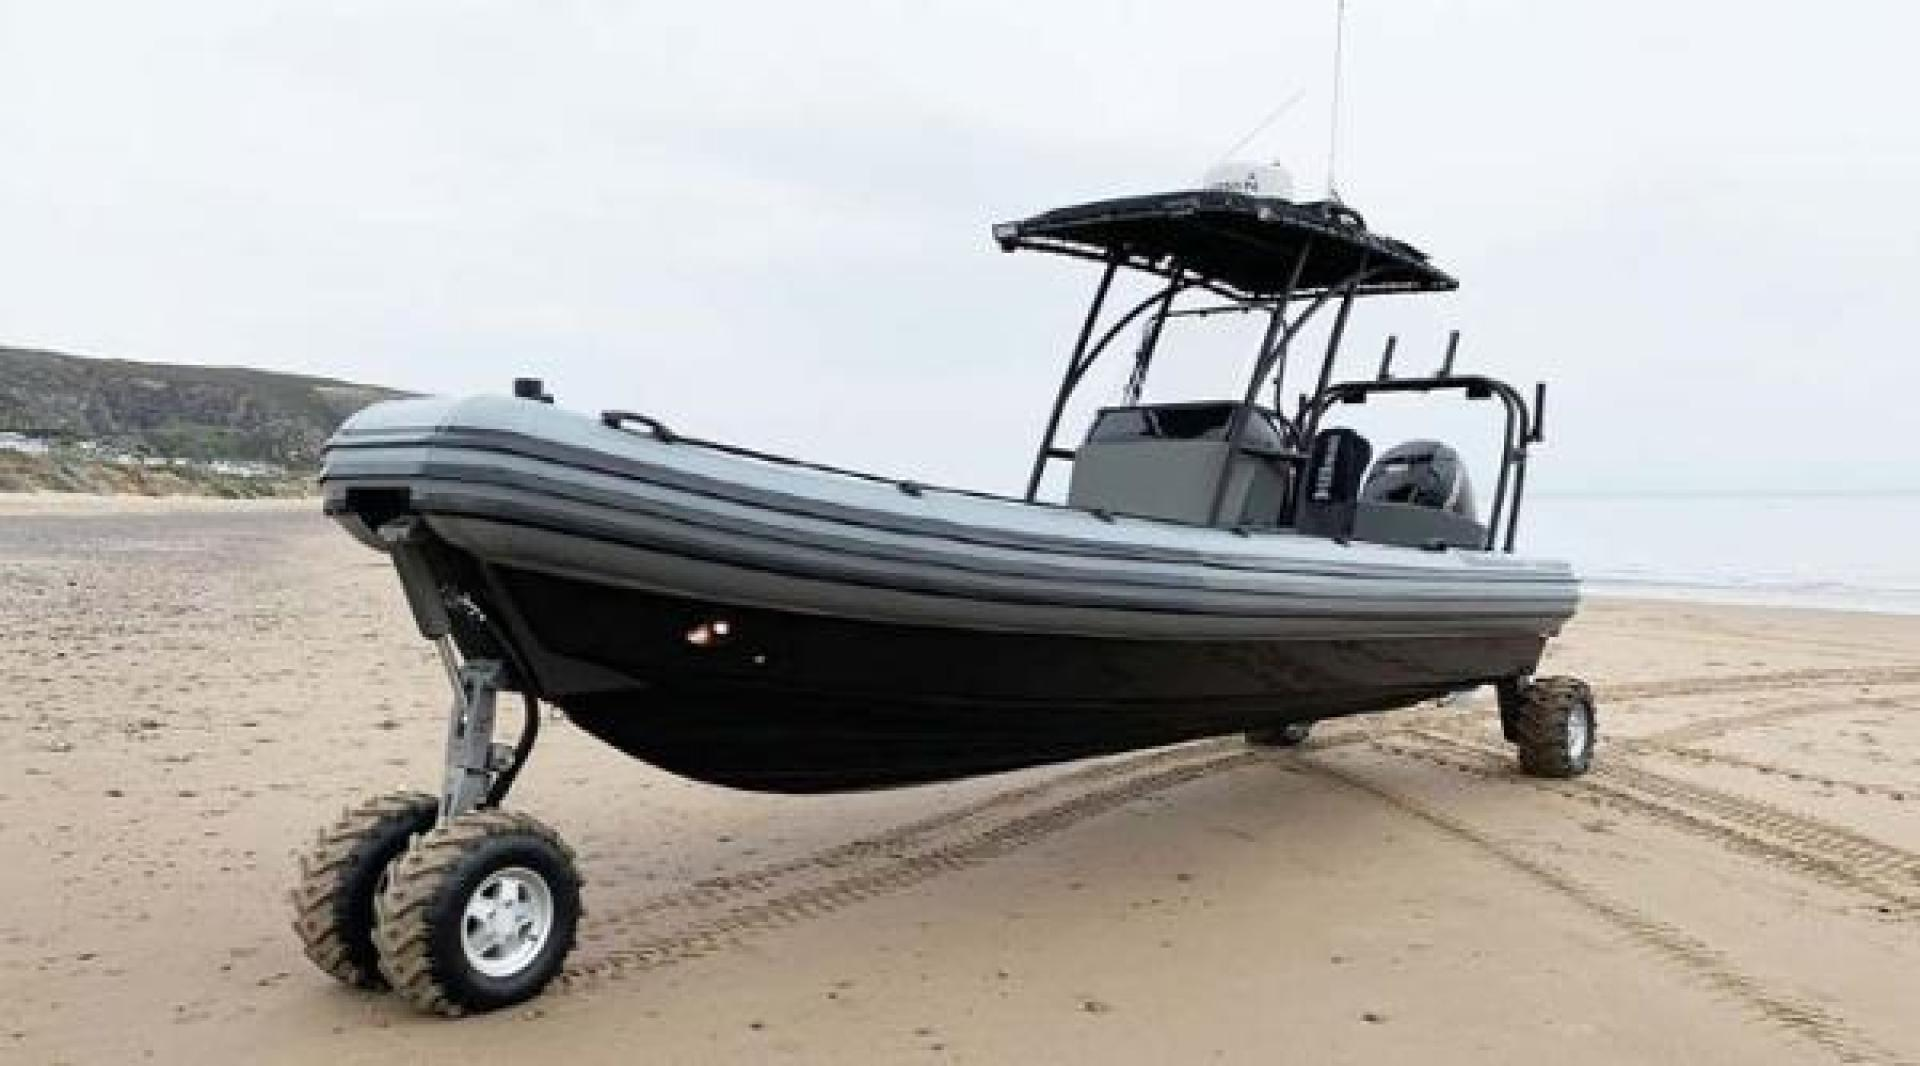 Ocean Craft Marine-8.4 M Amphibious 2020-Ocean Craft Marine 8.4 M Amphibious Fort Lauderdale-Florida-United States-1523046 | Thumbnail